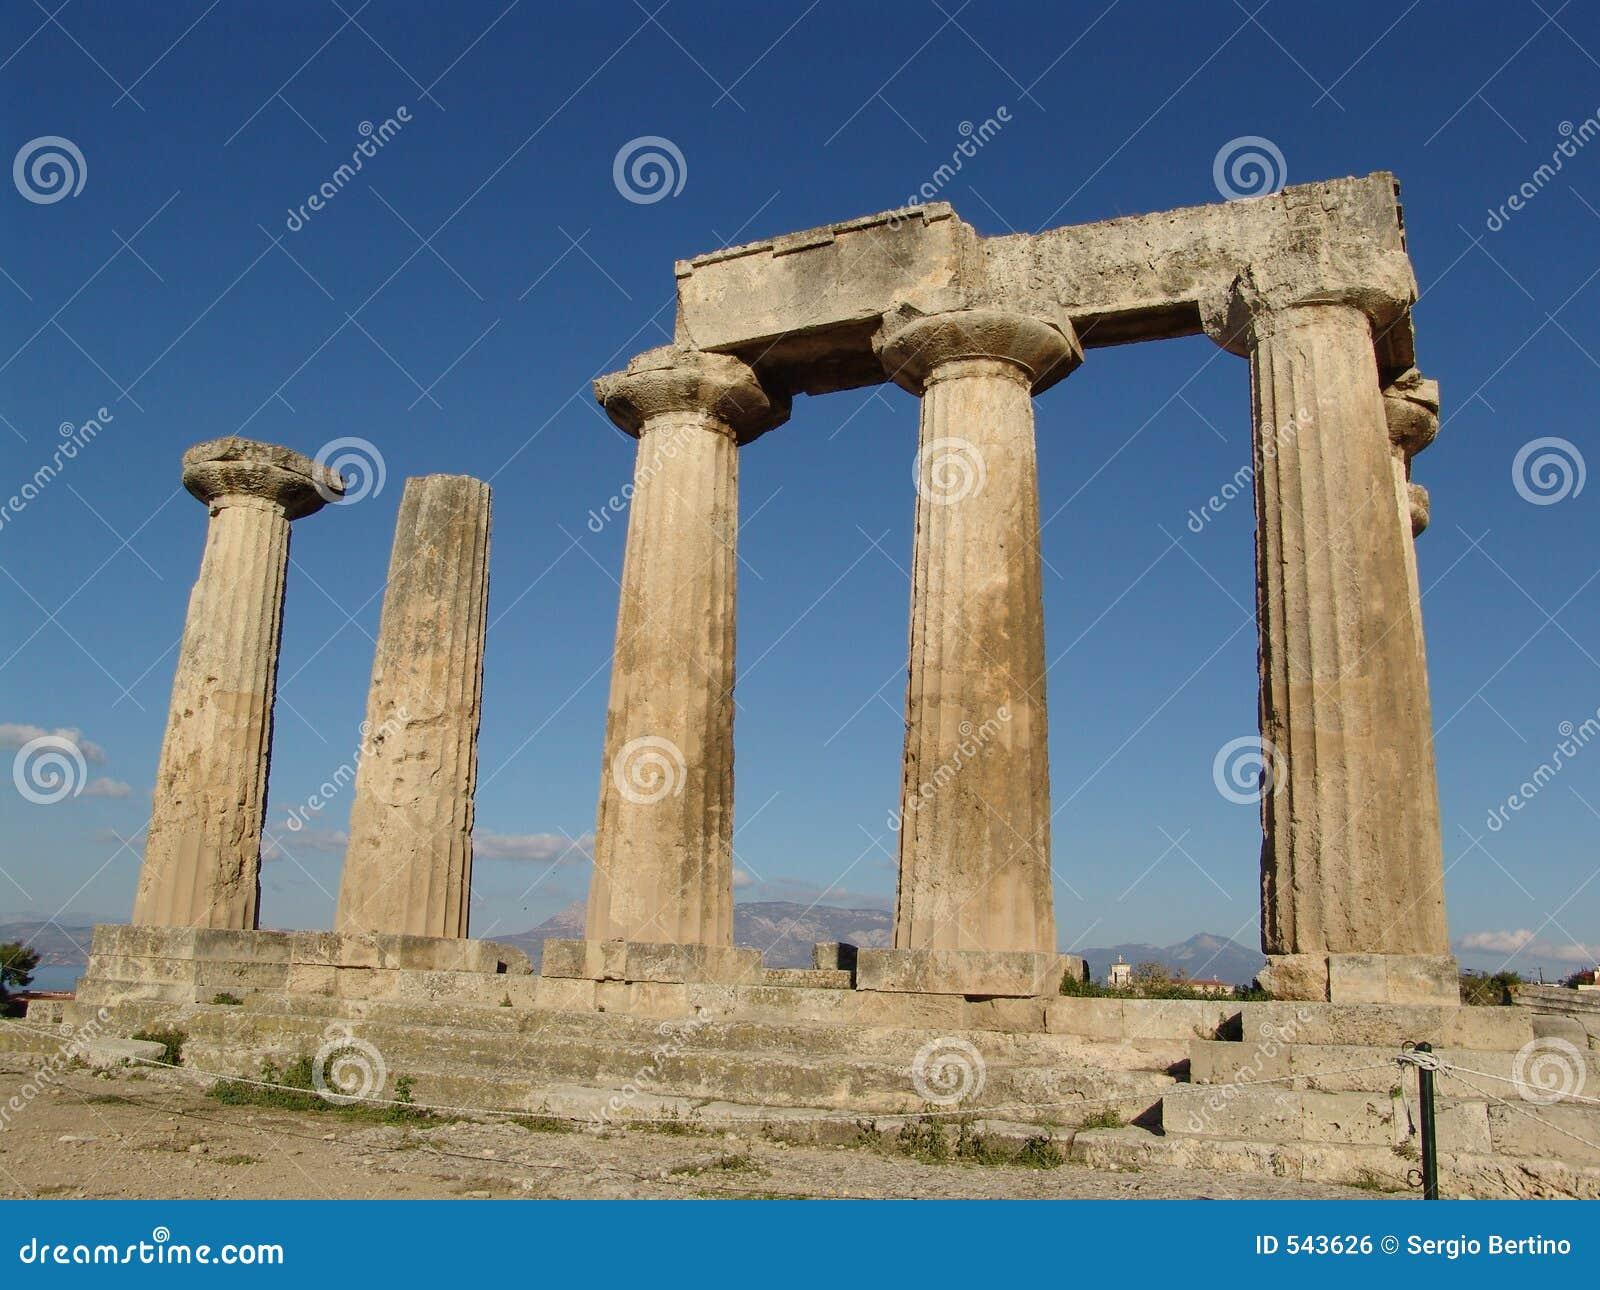 Download 1个阿波罗s寺庙 库存照片. 图片 包括有 顽皮地, 拱道, 地标, 天空, 背包, 蓝色, 历史, 镇痛药 - 543626